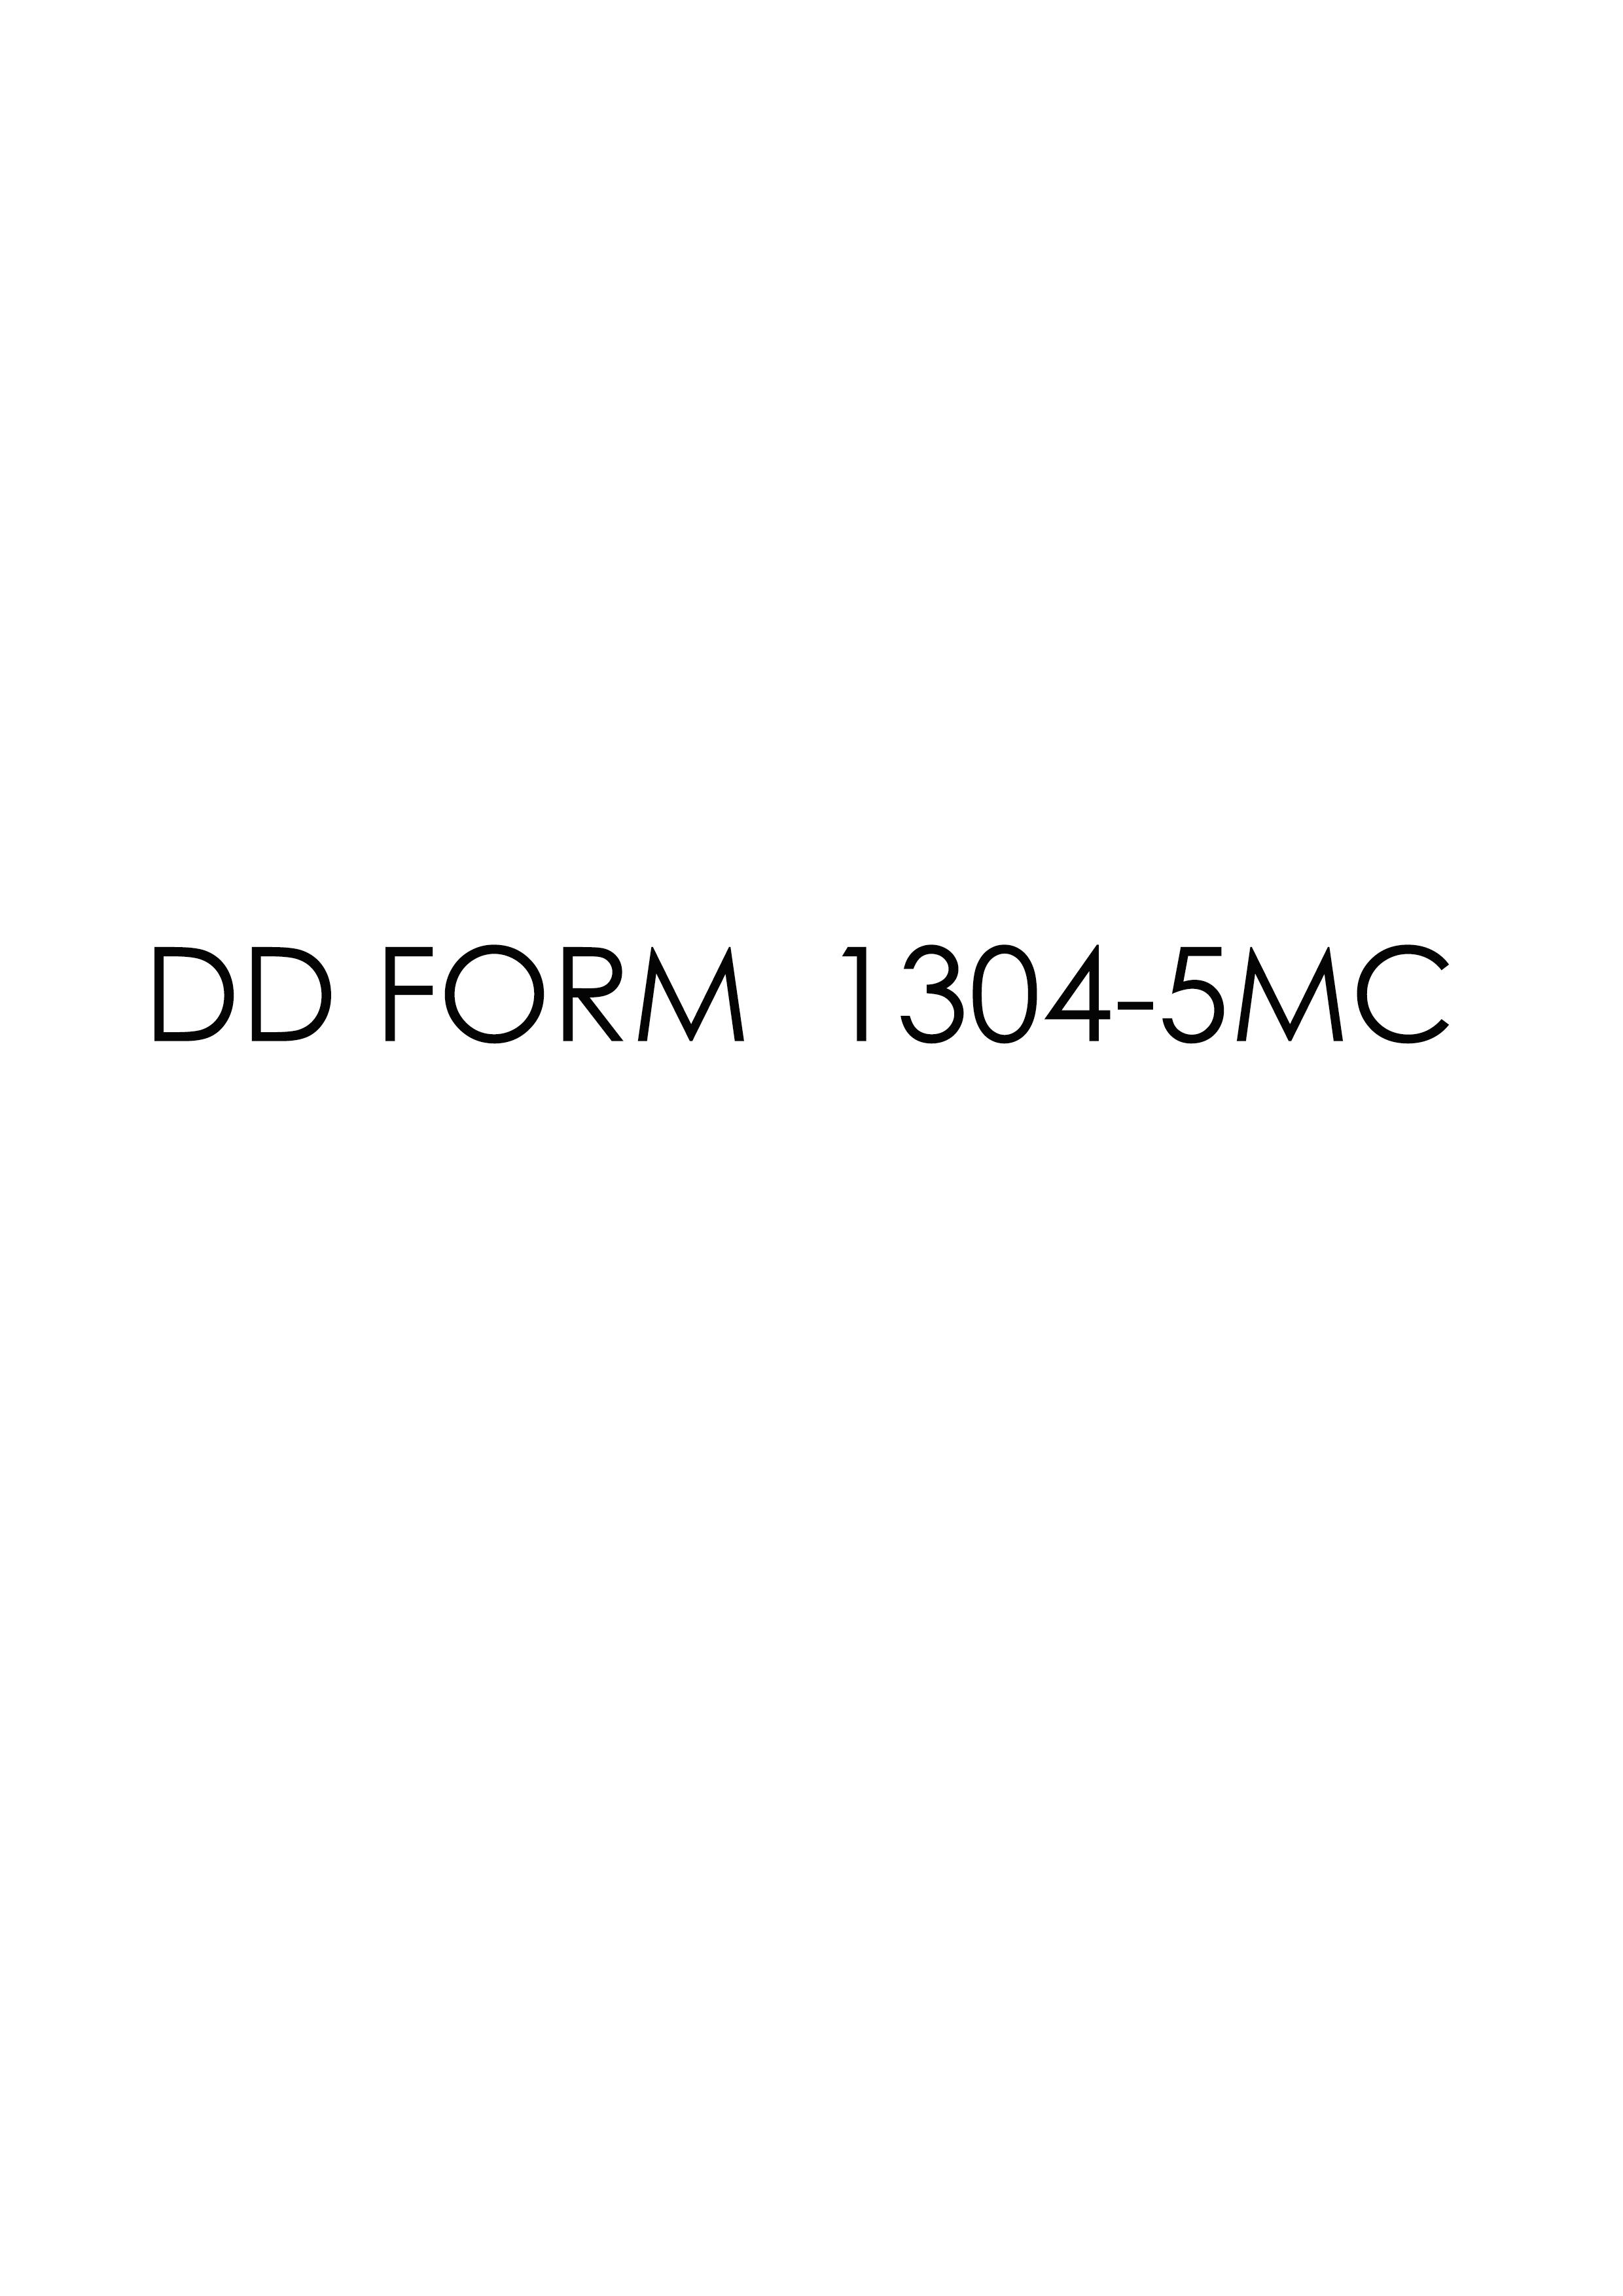 Download dd Form 1304-5MC Free